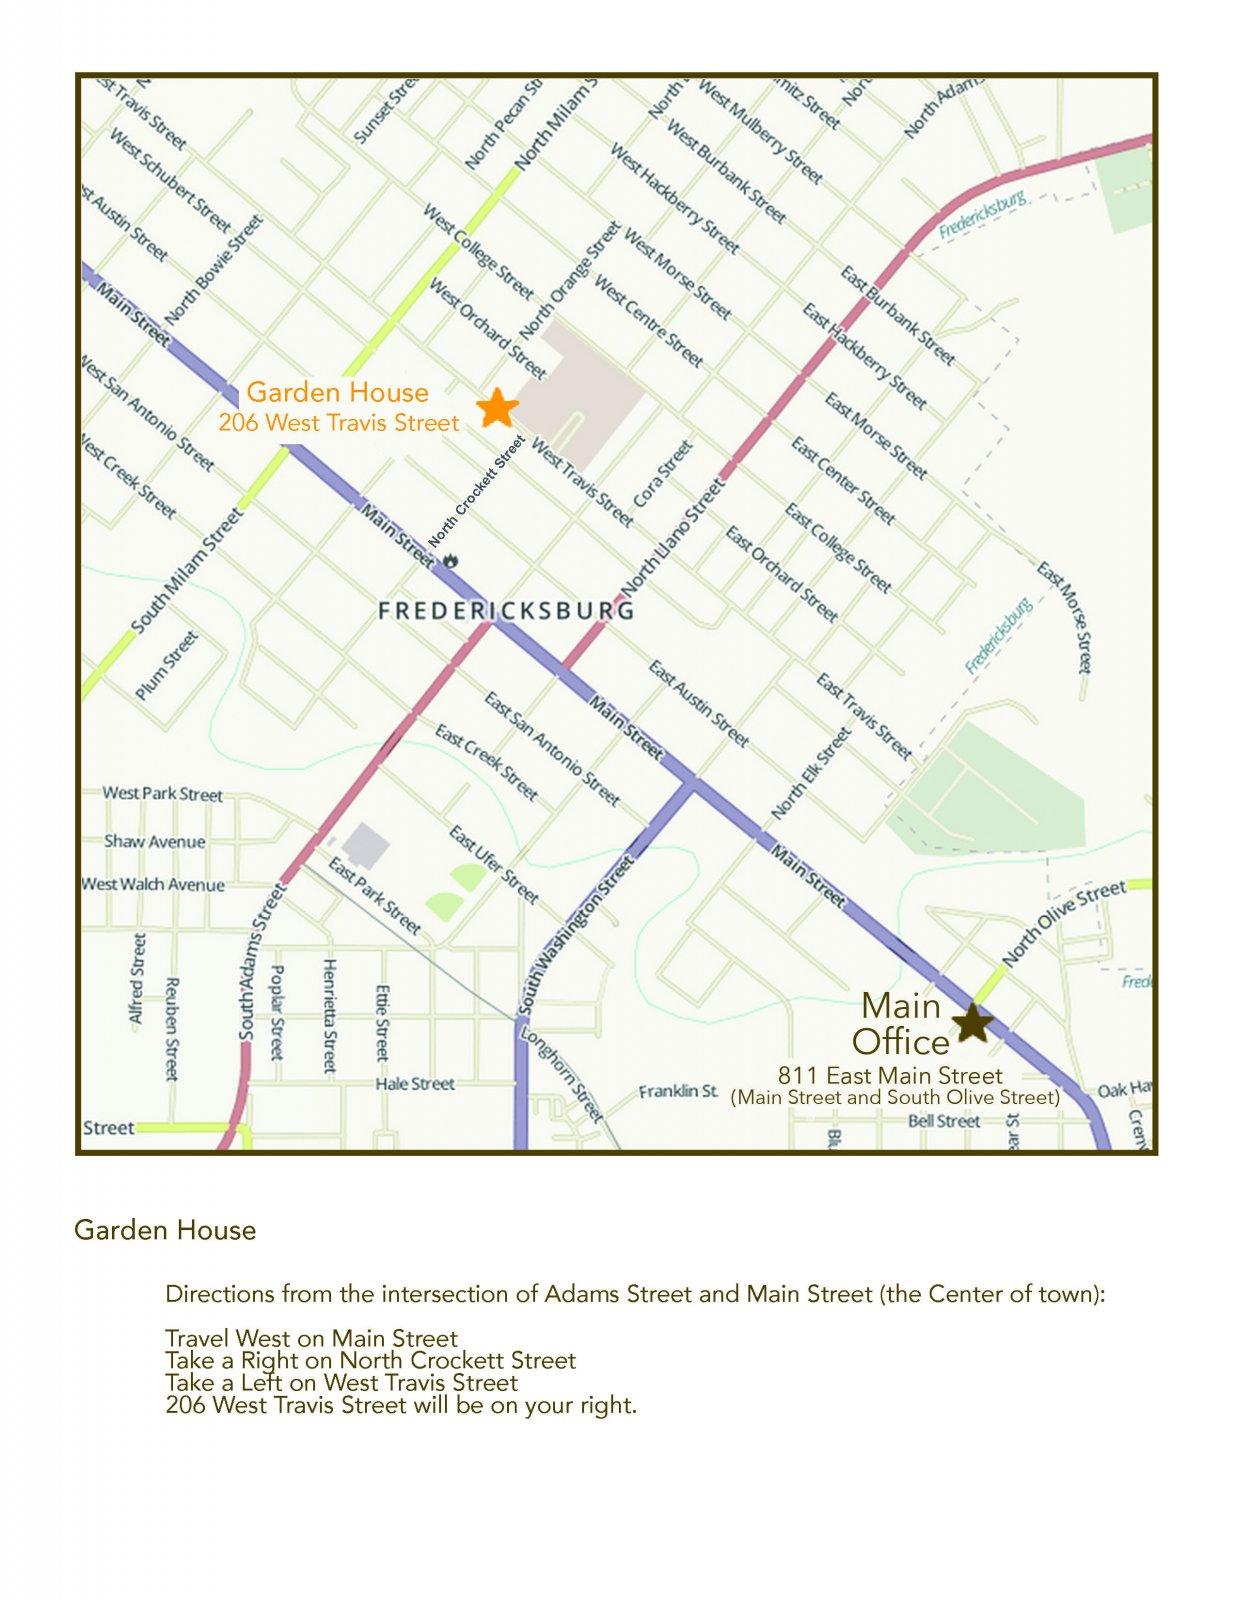 Garden House Map | The Maplestone, Luxury Lodging of Fredericksburg, Texas